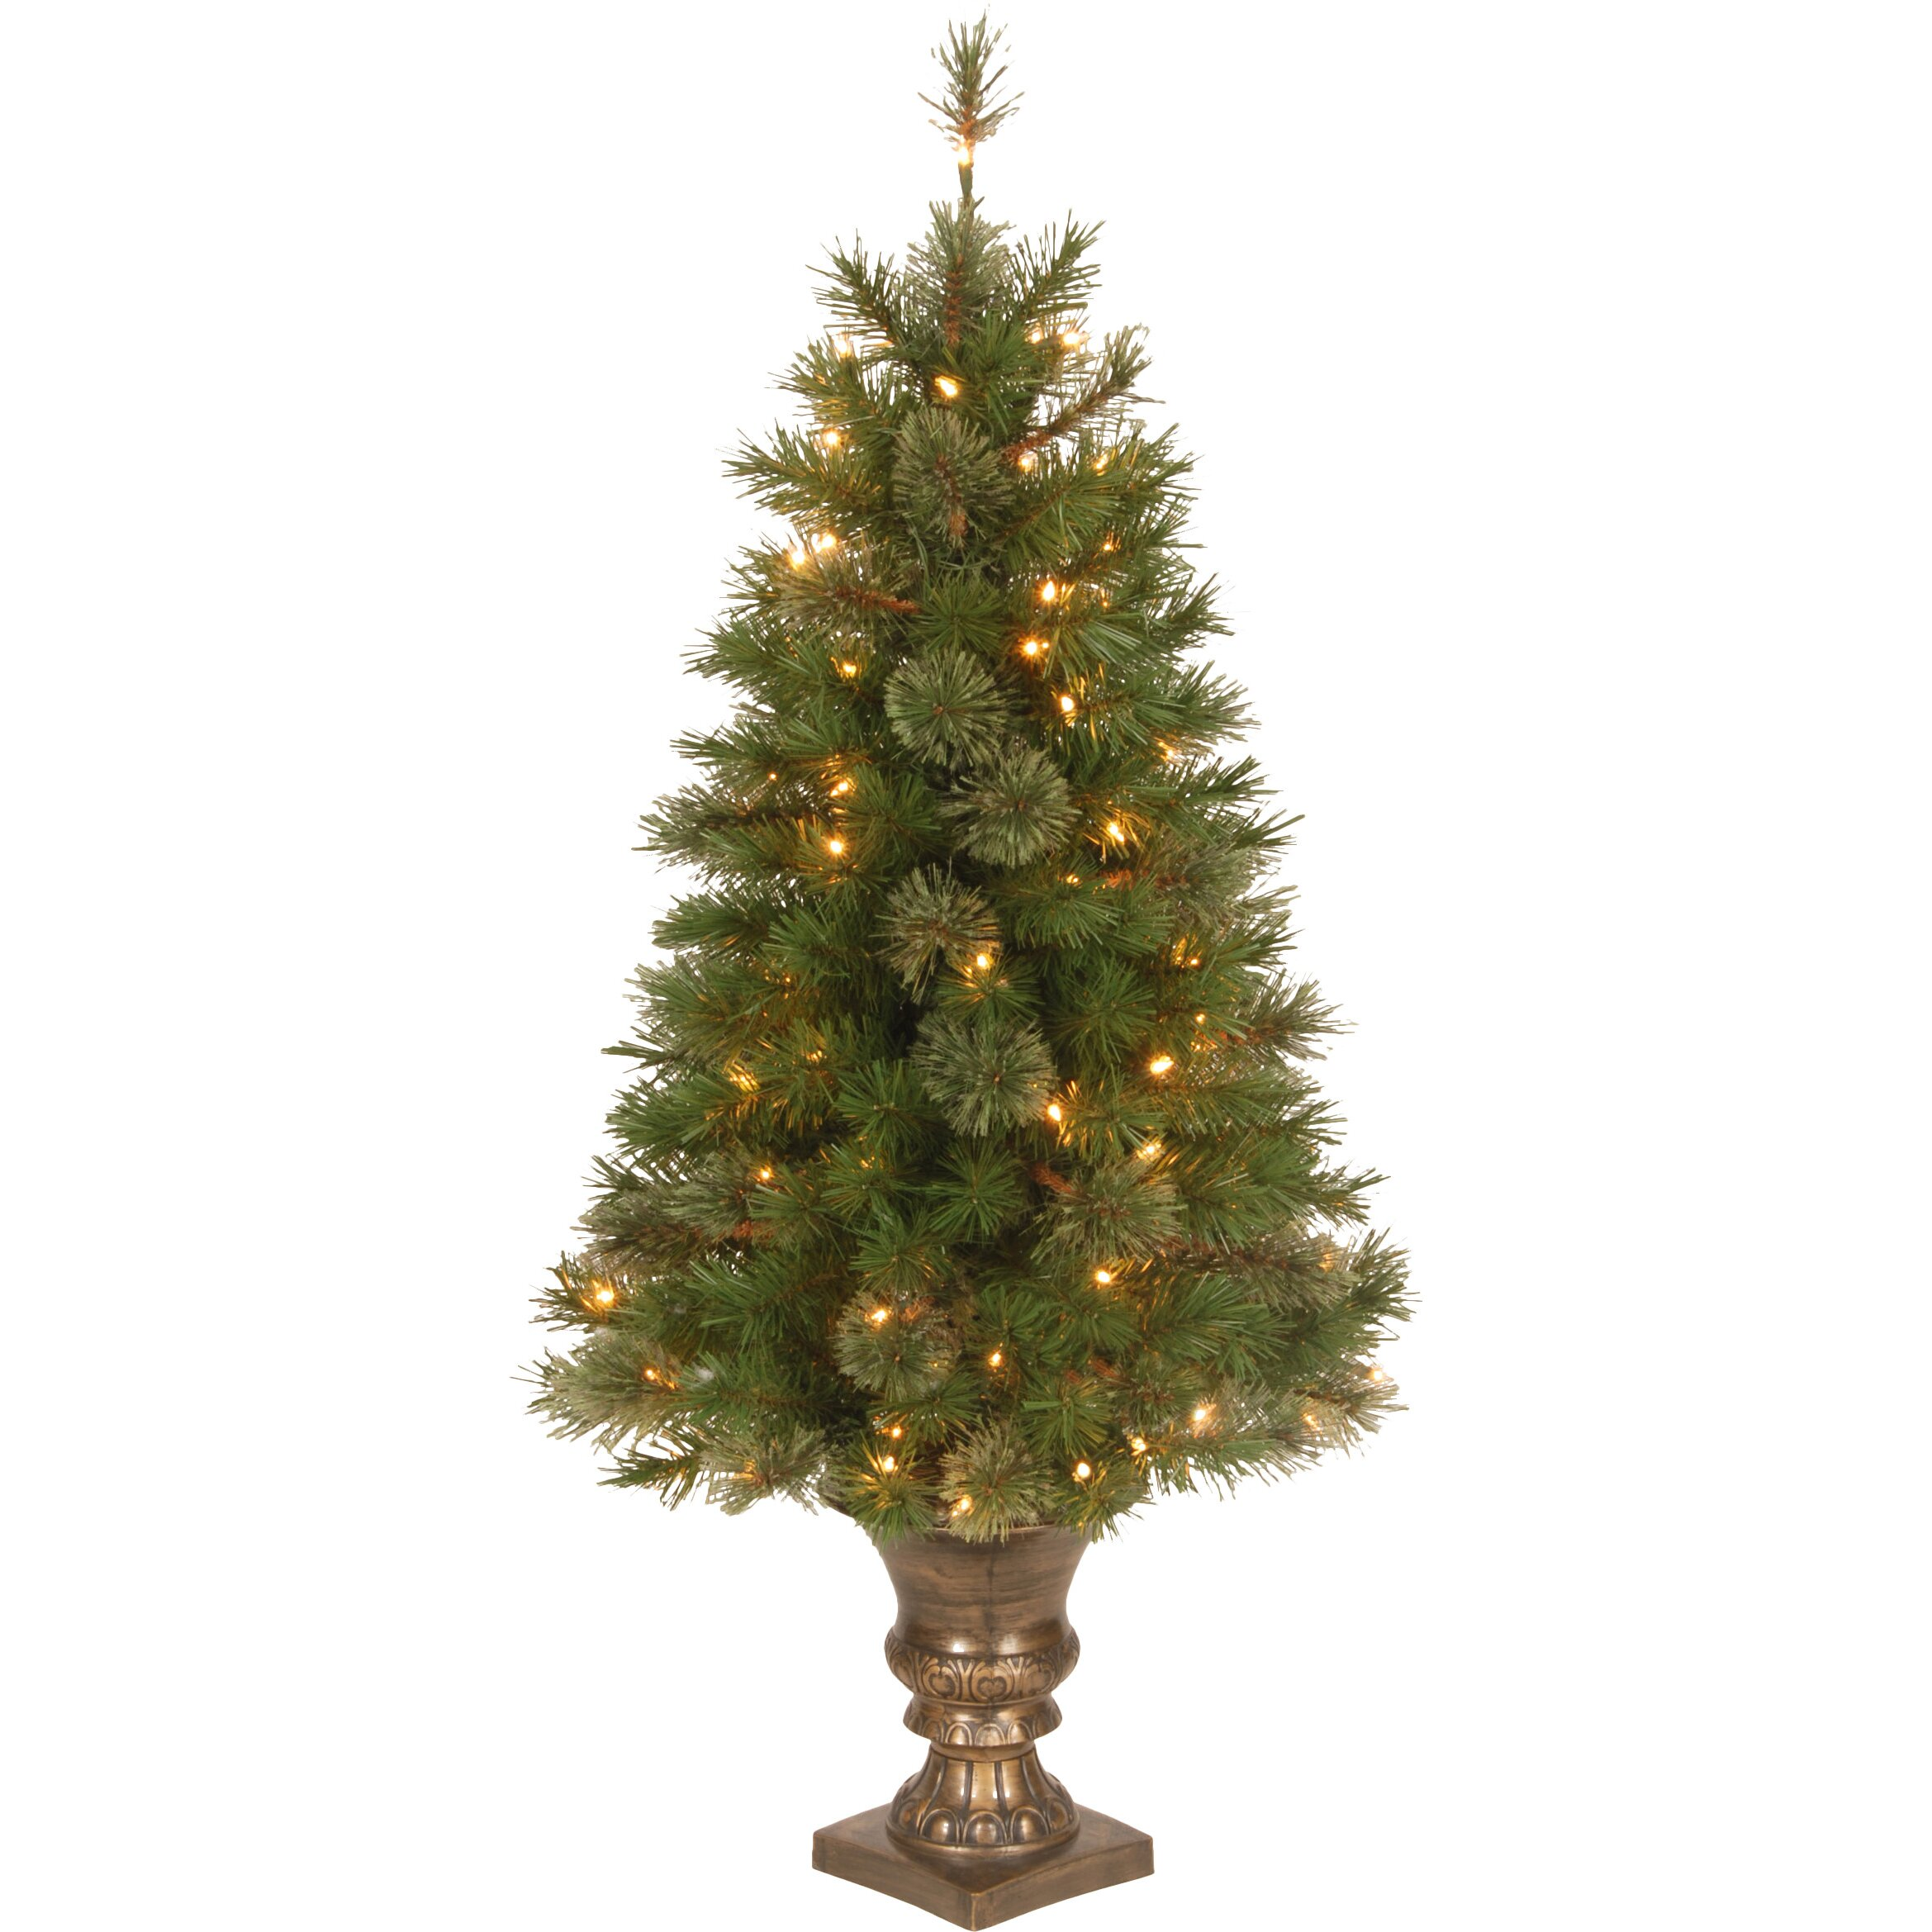 Christmas Tree Company Greytown : National tree co atlanta spruce green artificial